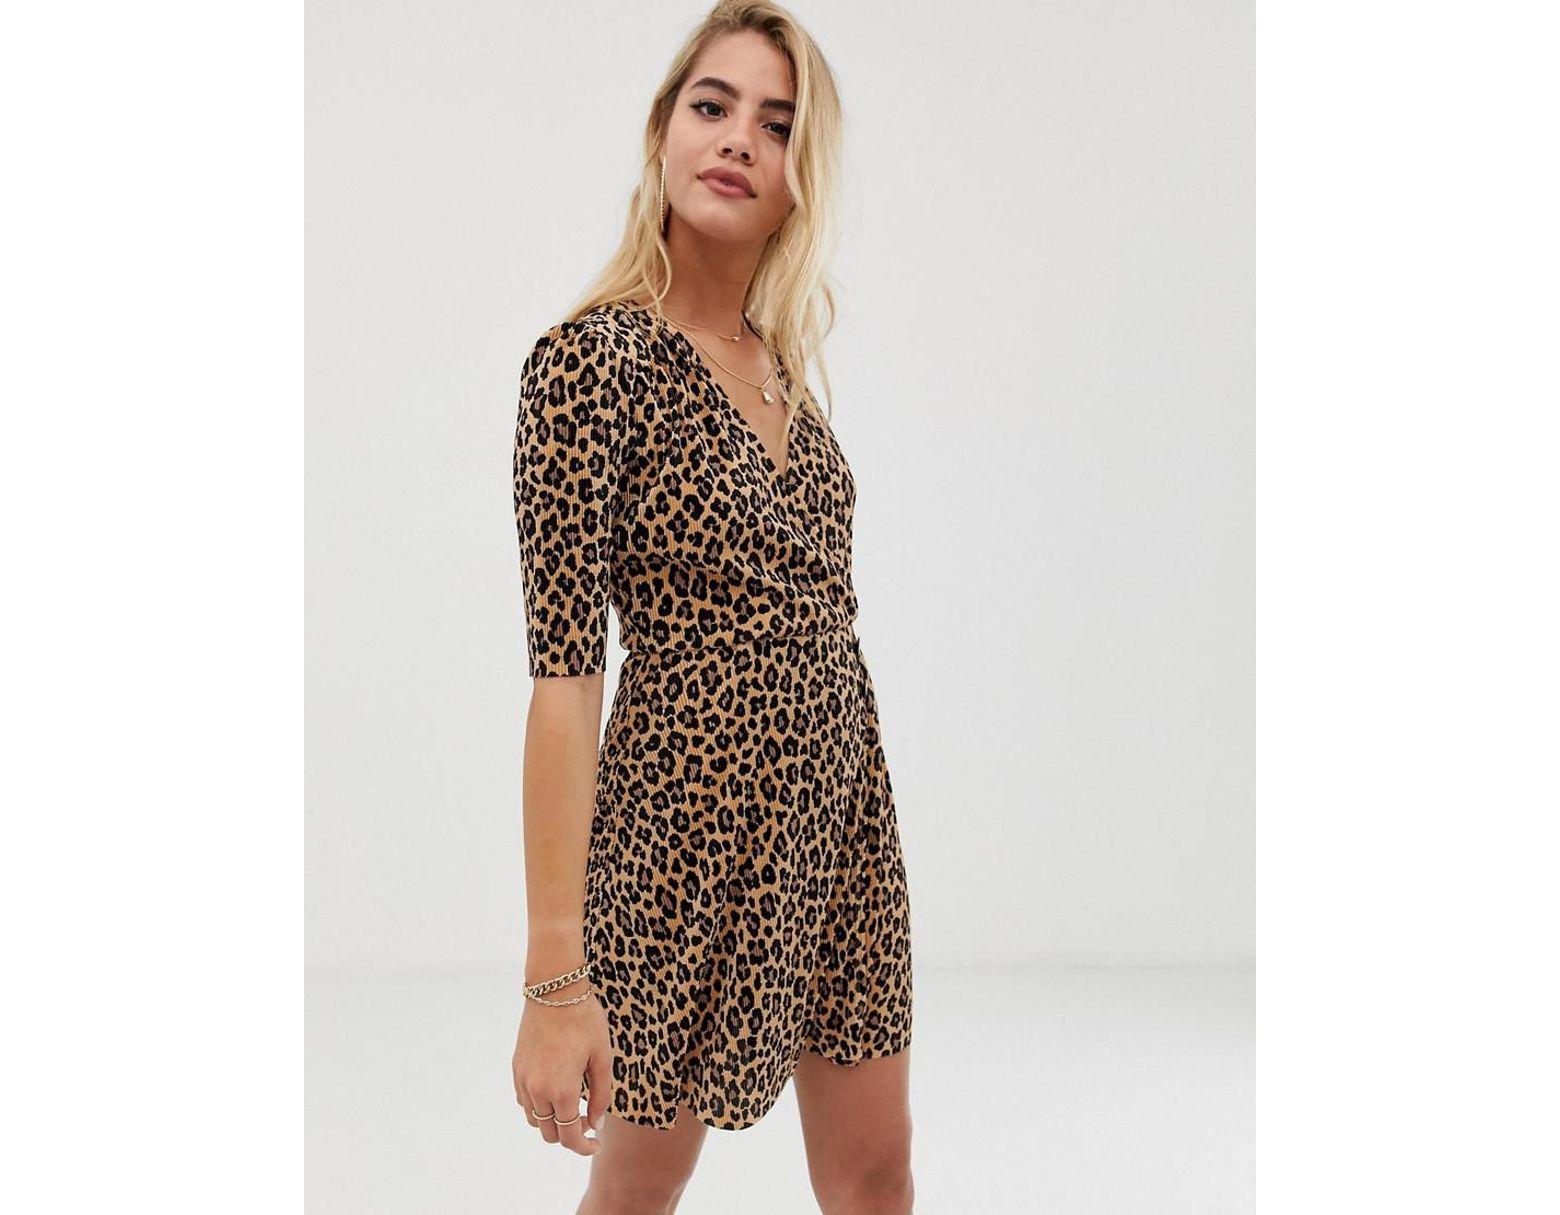 66f52b896da7 ASOS Leopard Print Plisse Mini Dress With Button Detail in Brown - Lyst